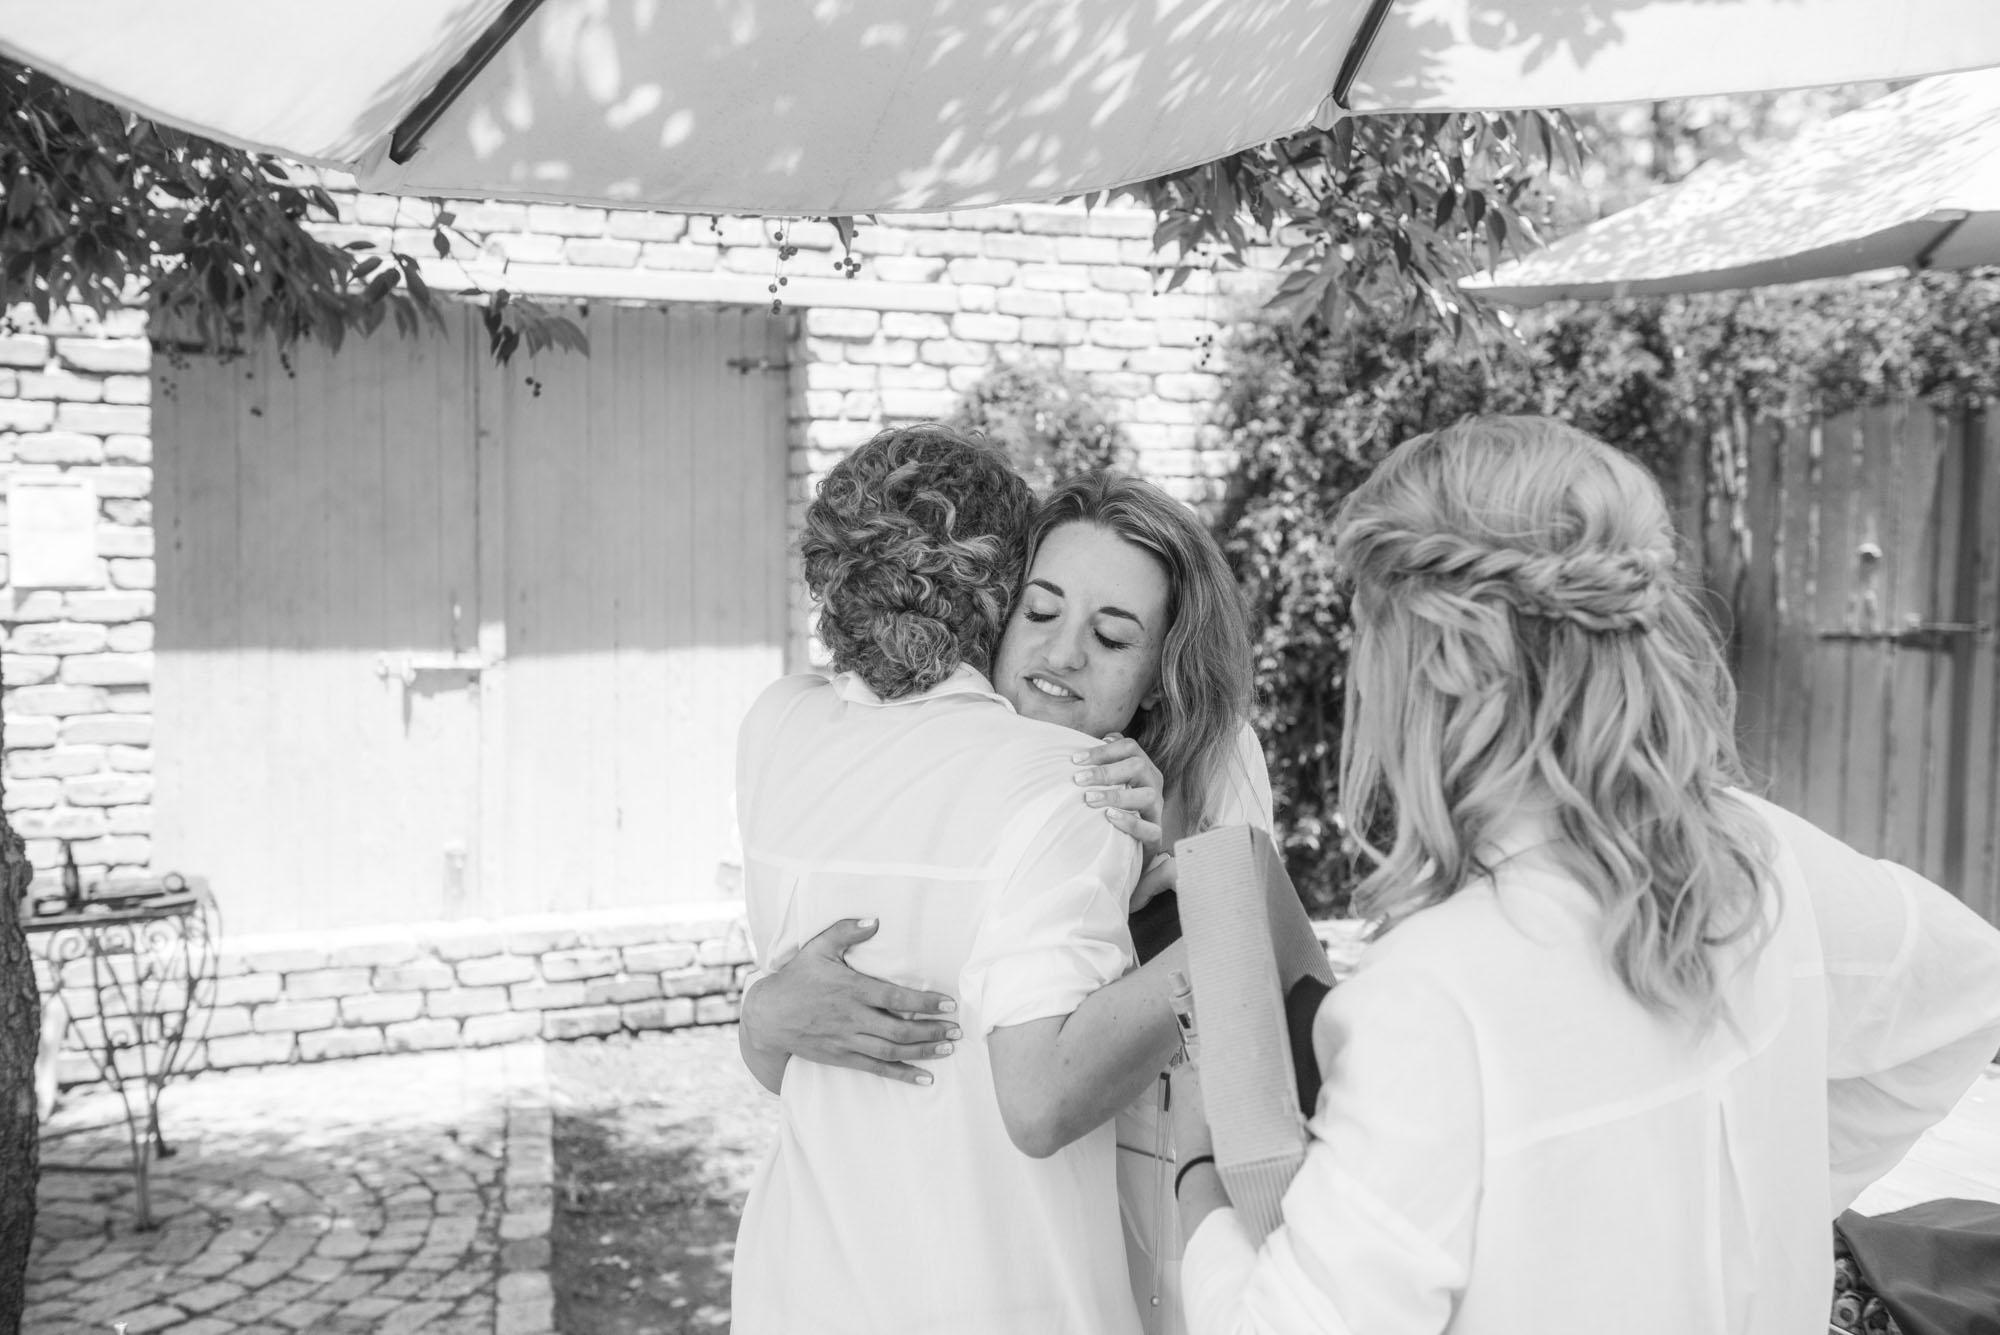 050b-pretoria-wedding-photographers-johannesburg050b-pretoria-wedding-photographers-johannesburg_a.jpg